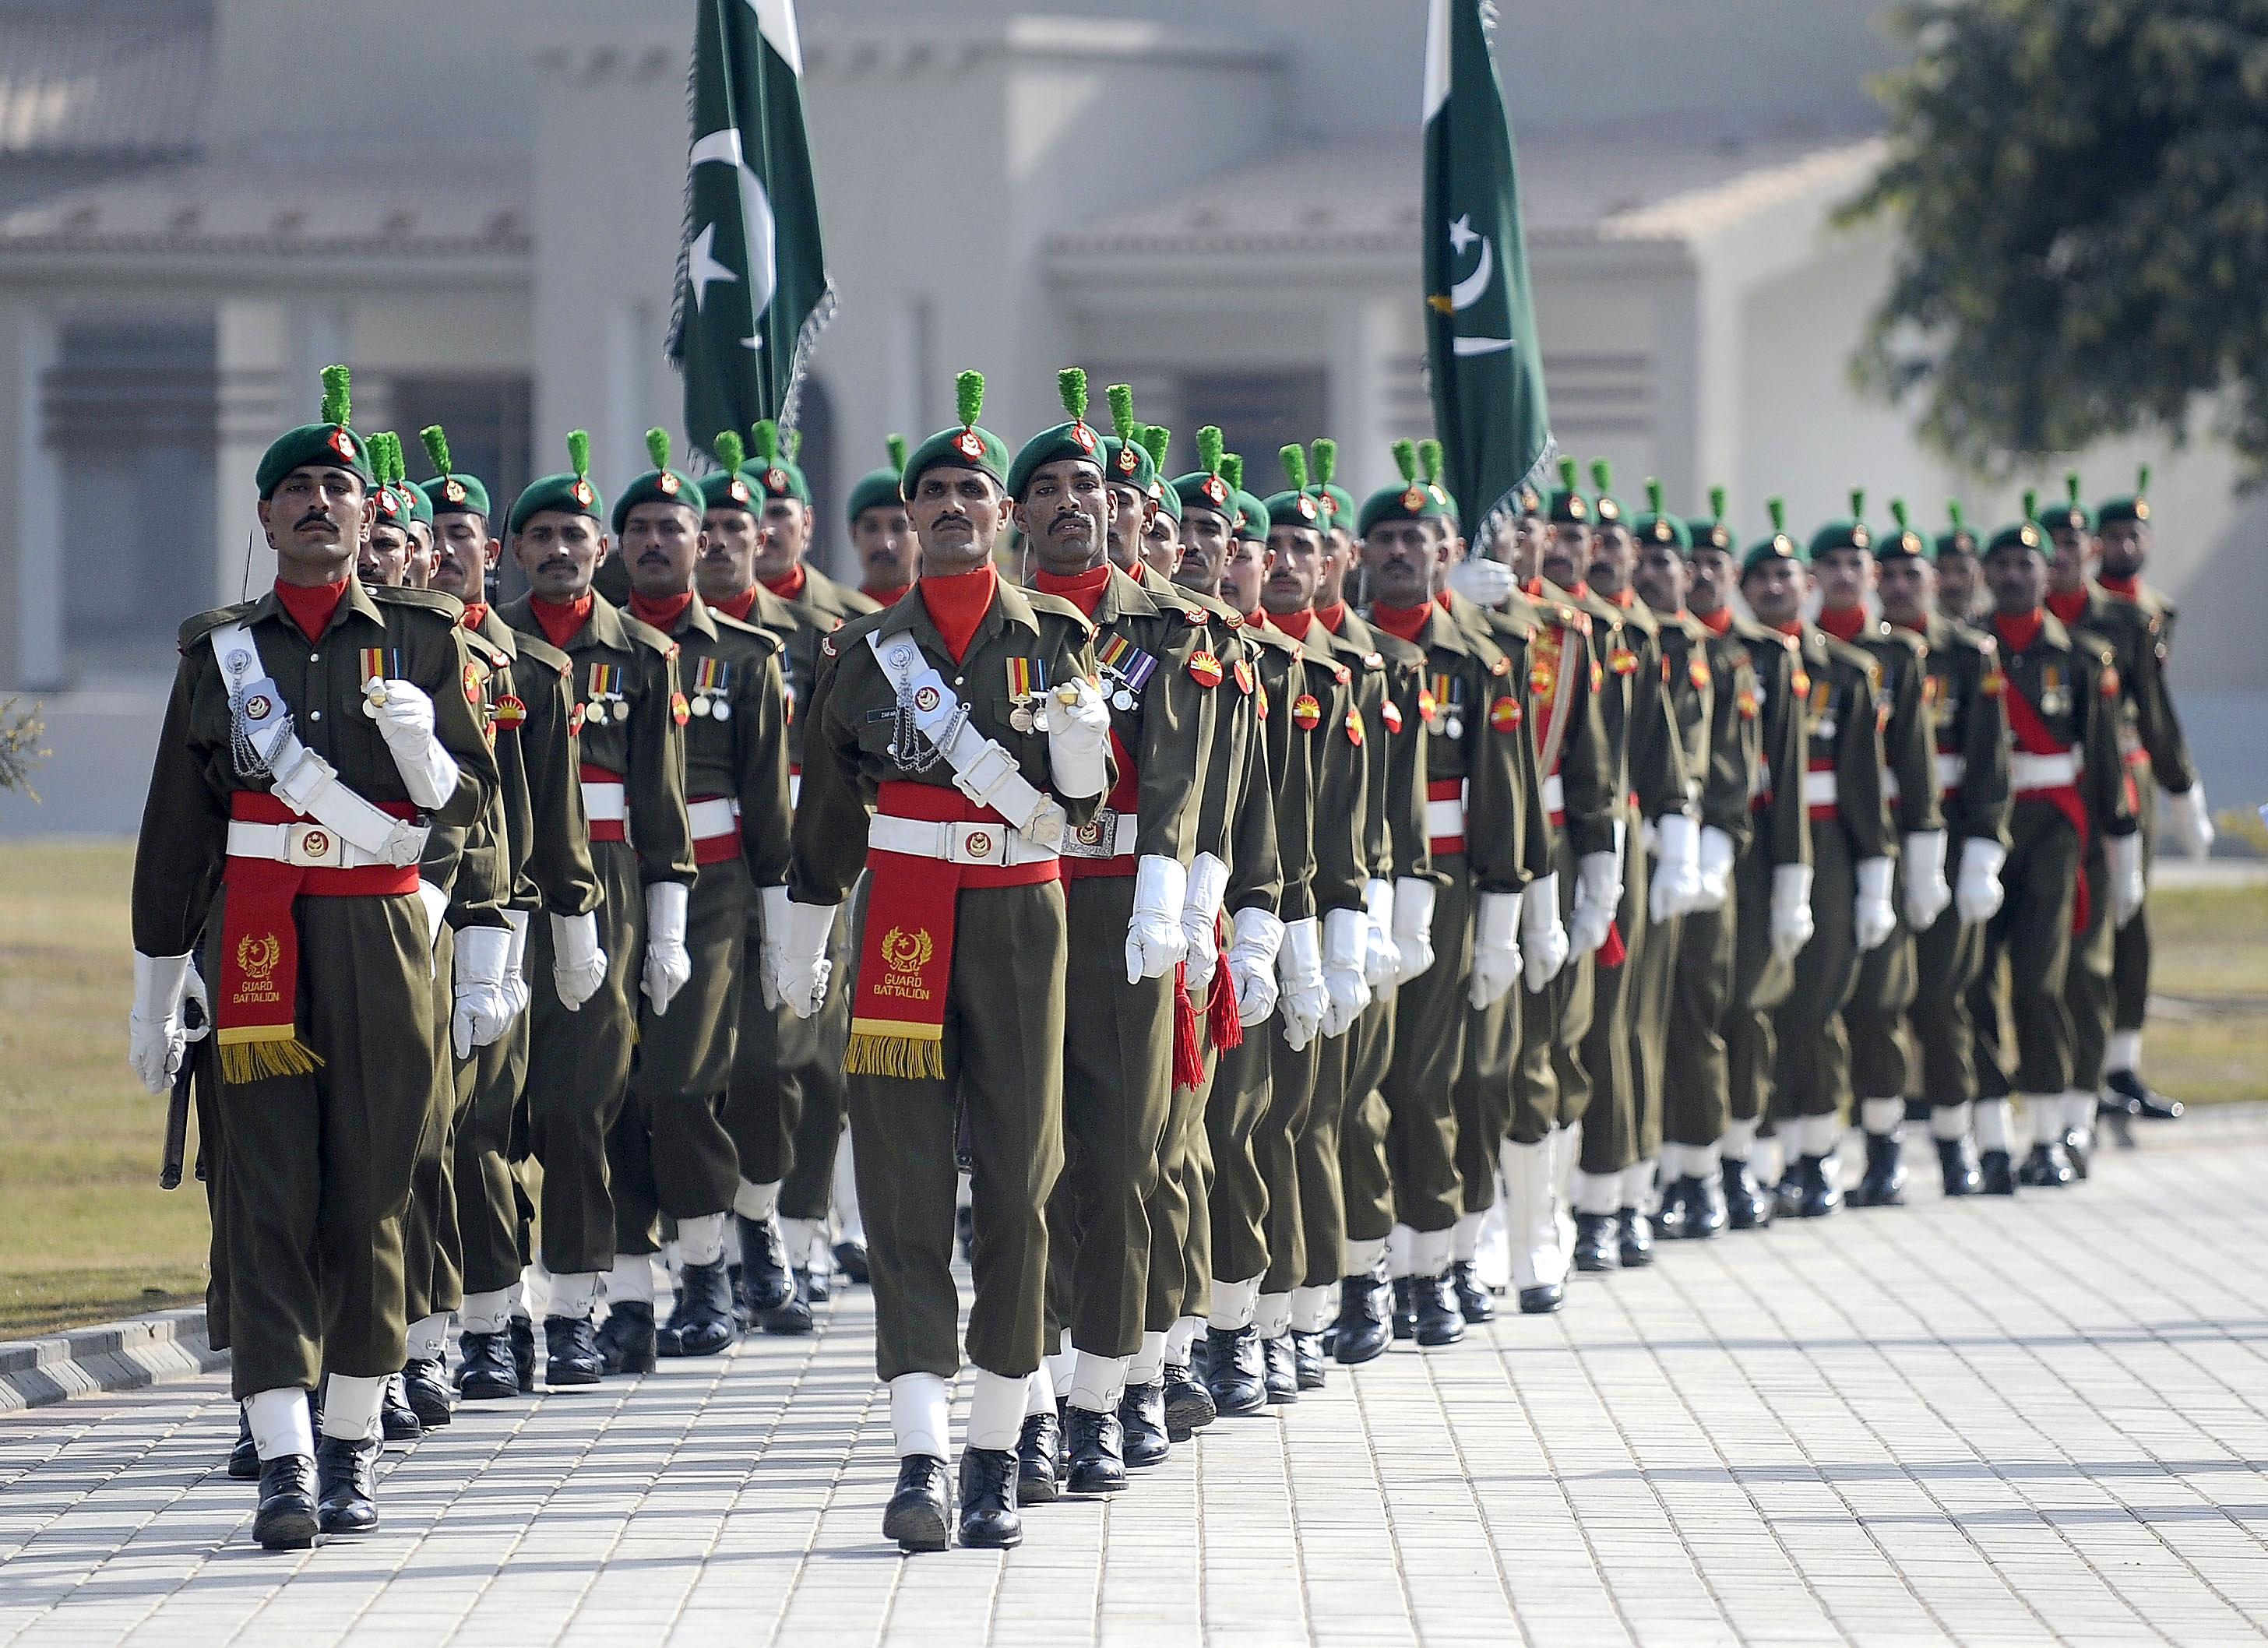 Honor guard | Military Wiki | FANDOM powered by Wikia